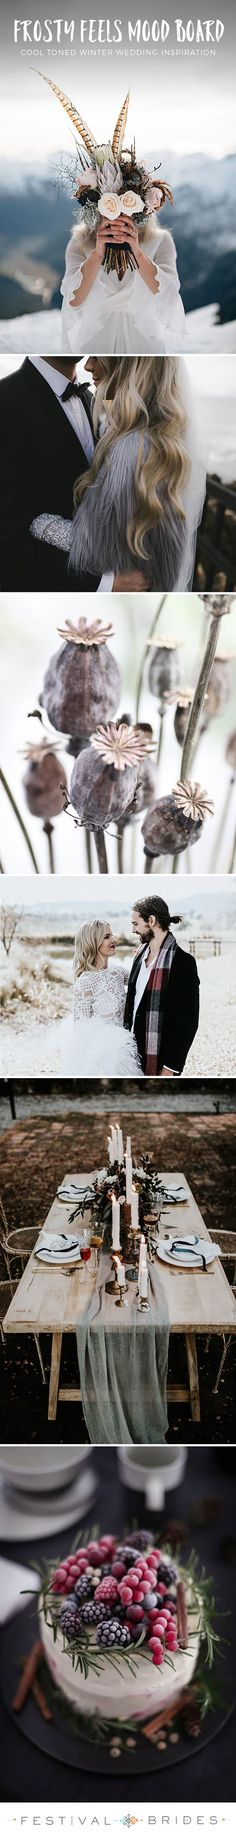 FESTIVAL BRIDES | Fr